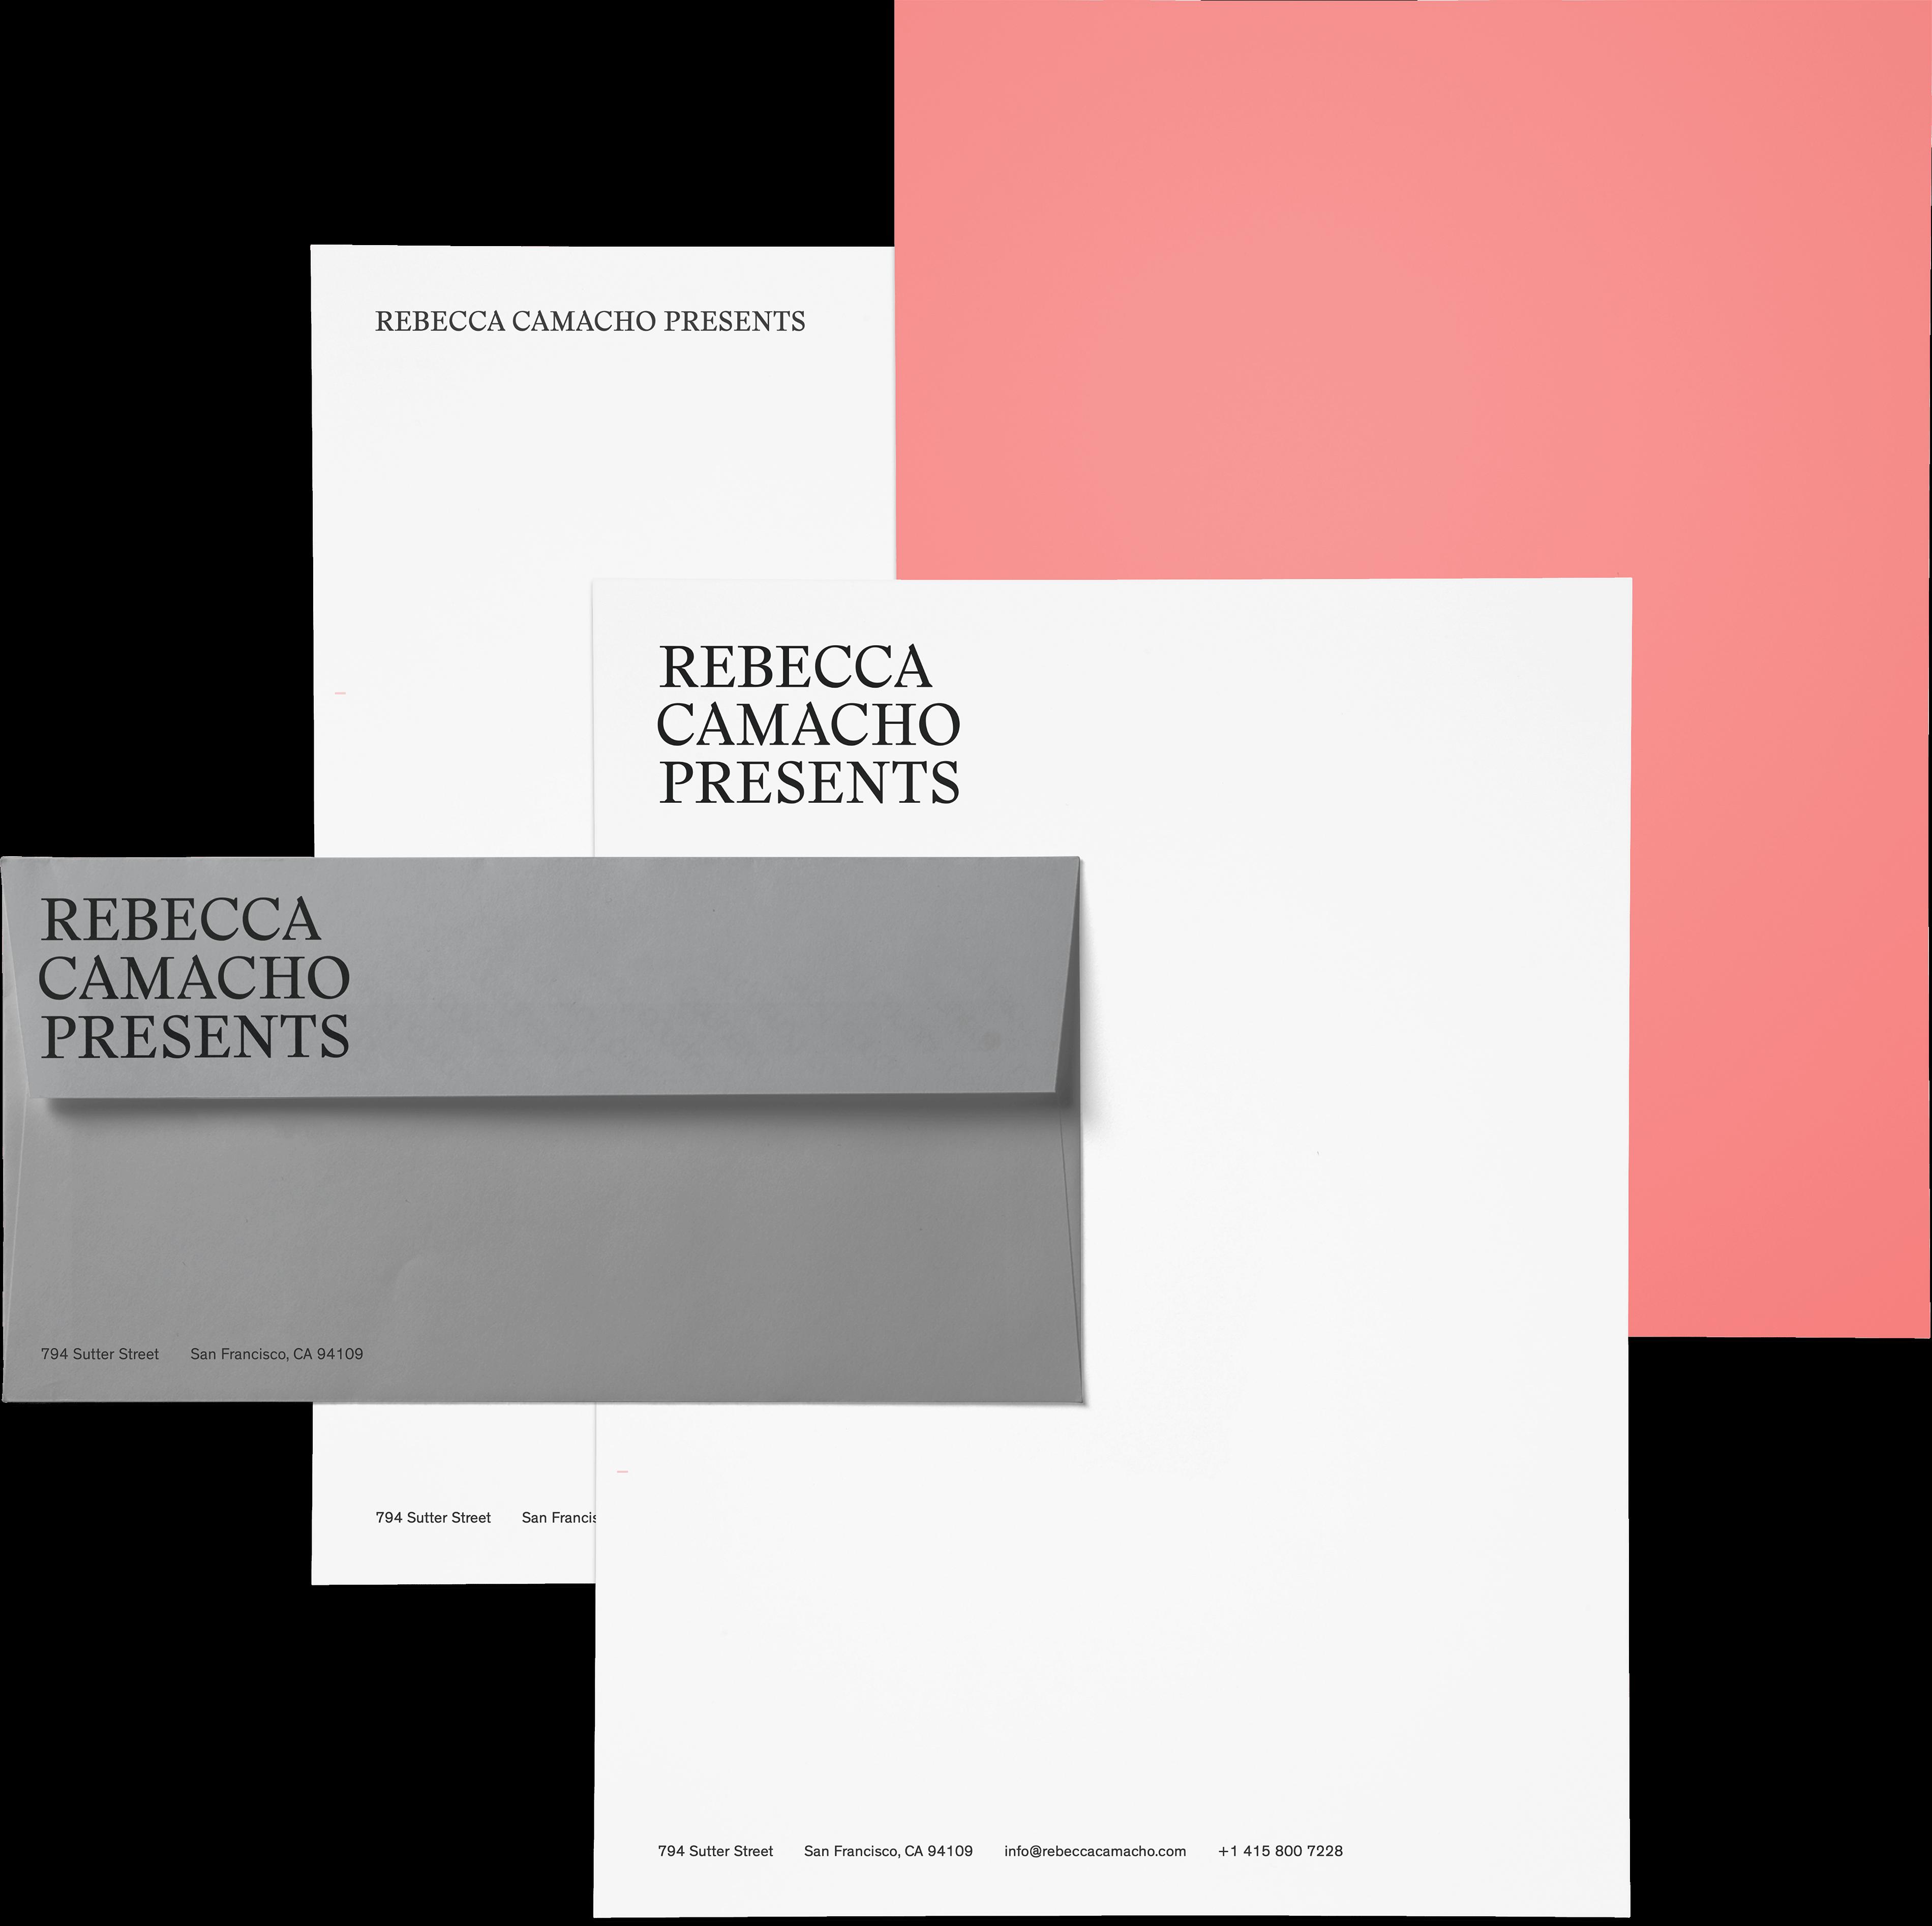 Rebecca Camacho Presents stationery